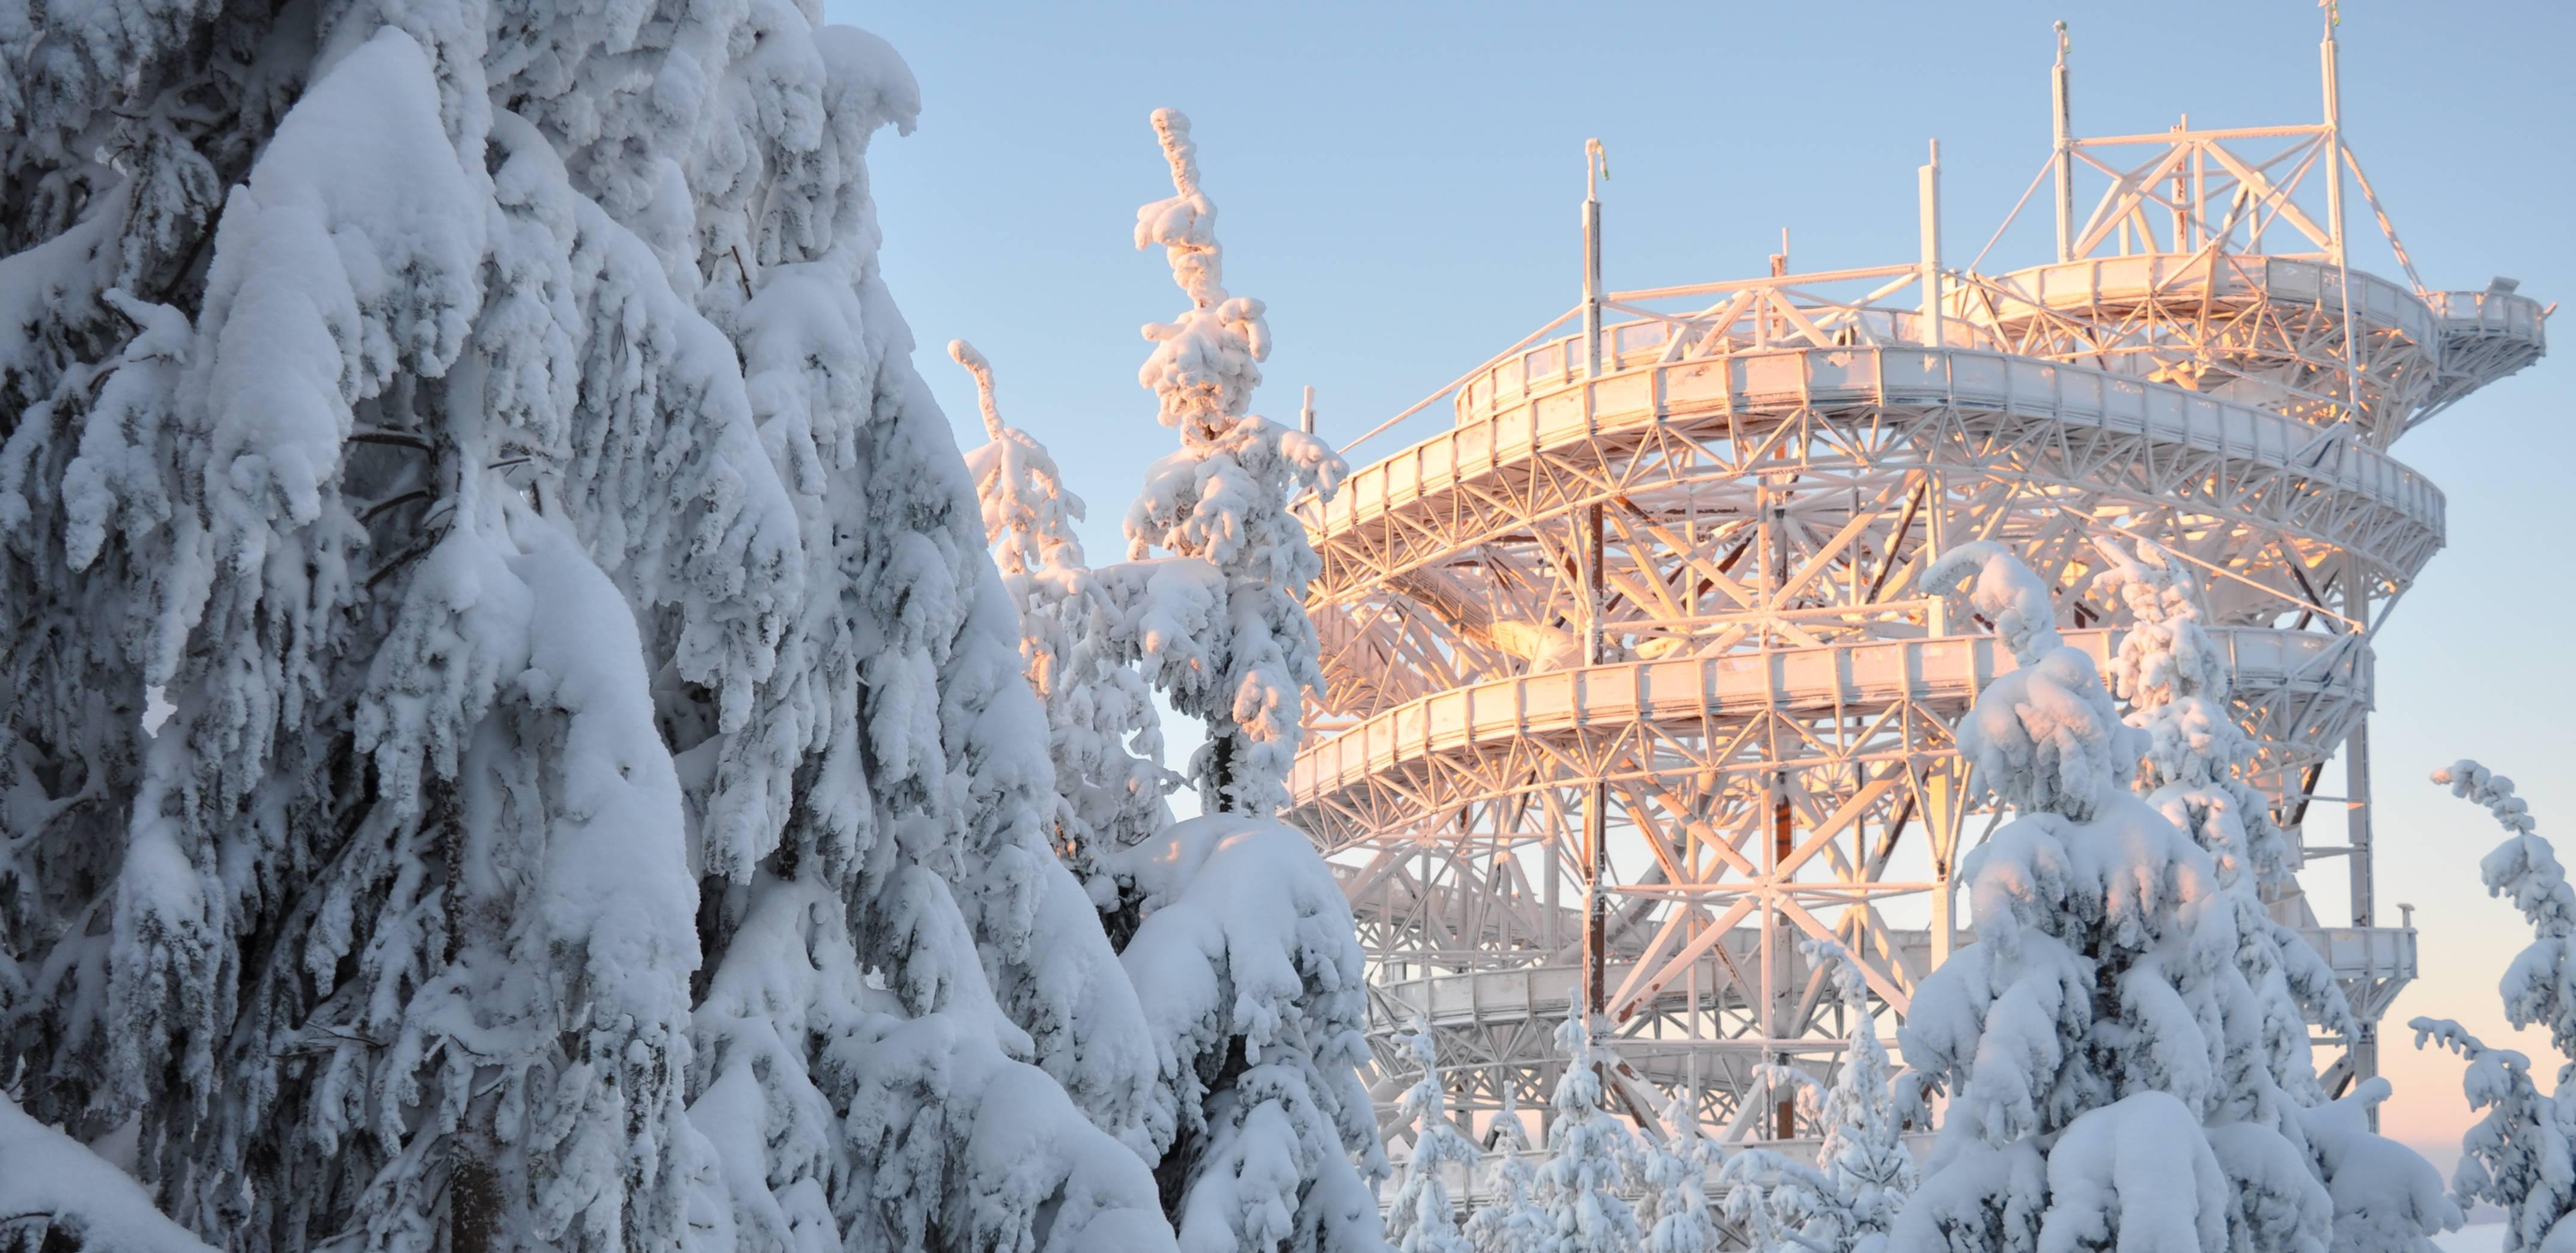 Platforma widokowa czechy zima panorama widoki